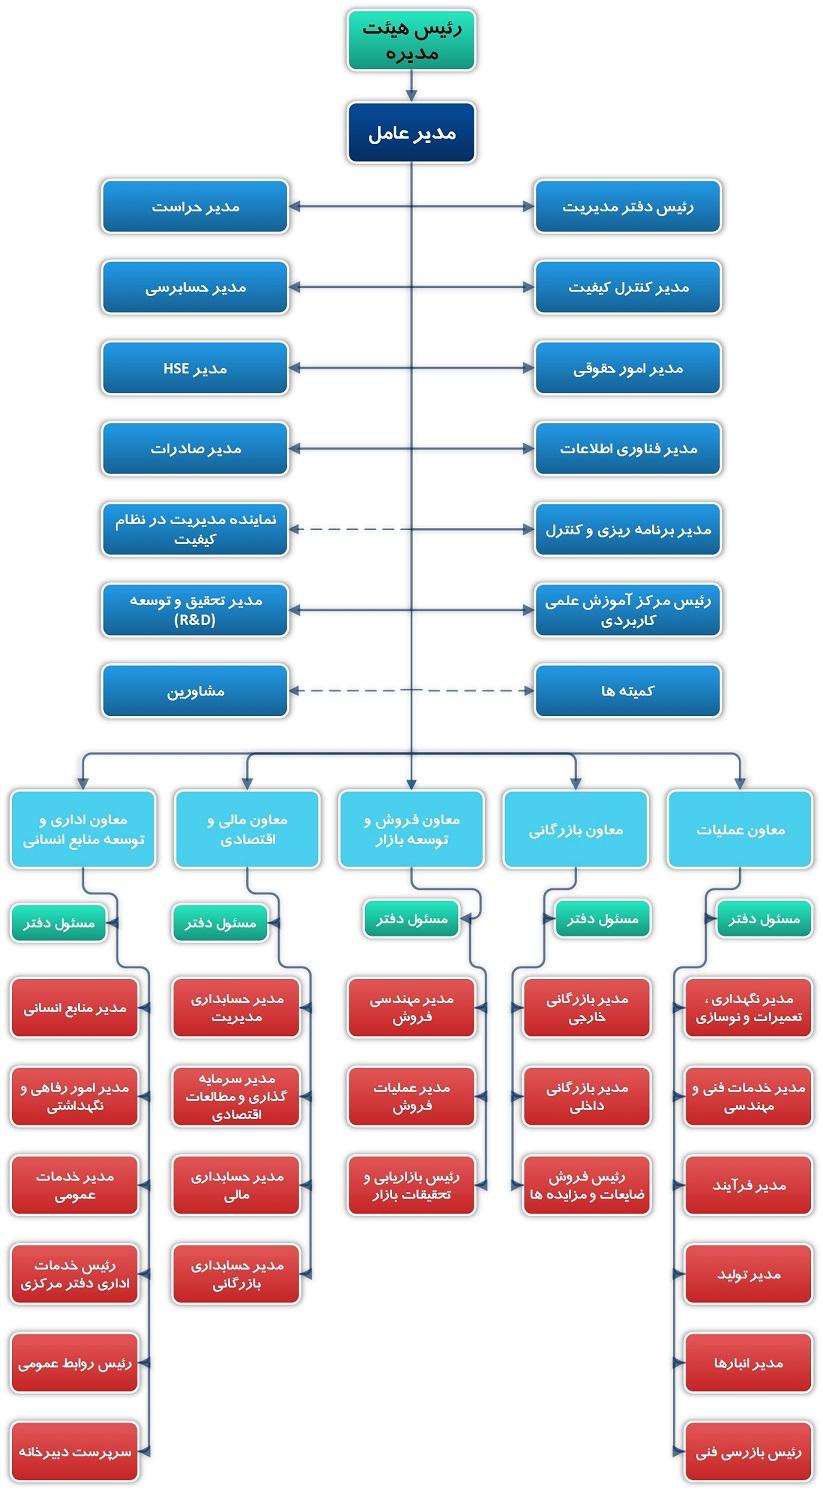 ساختار سازماني